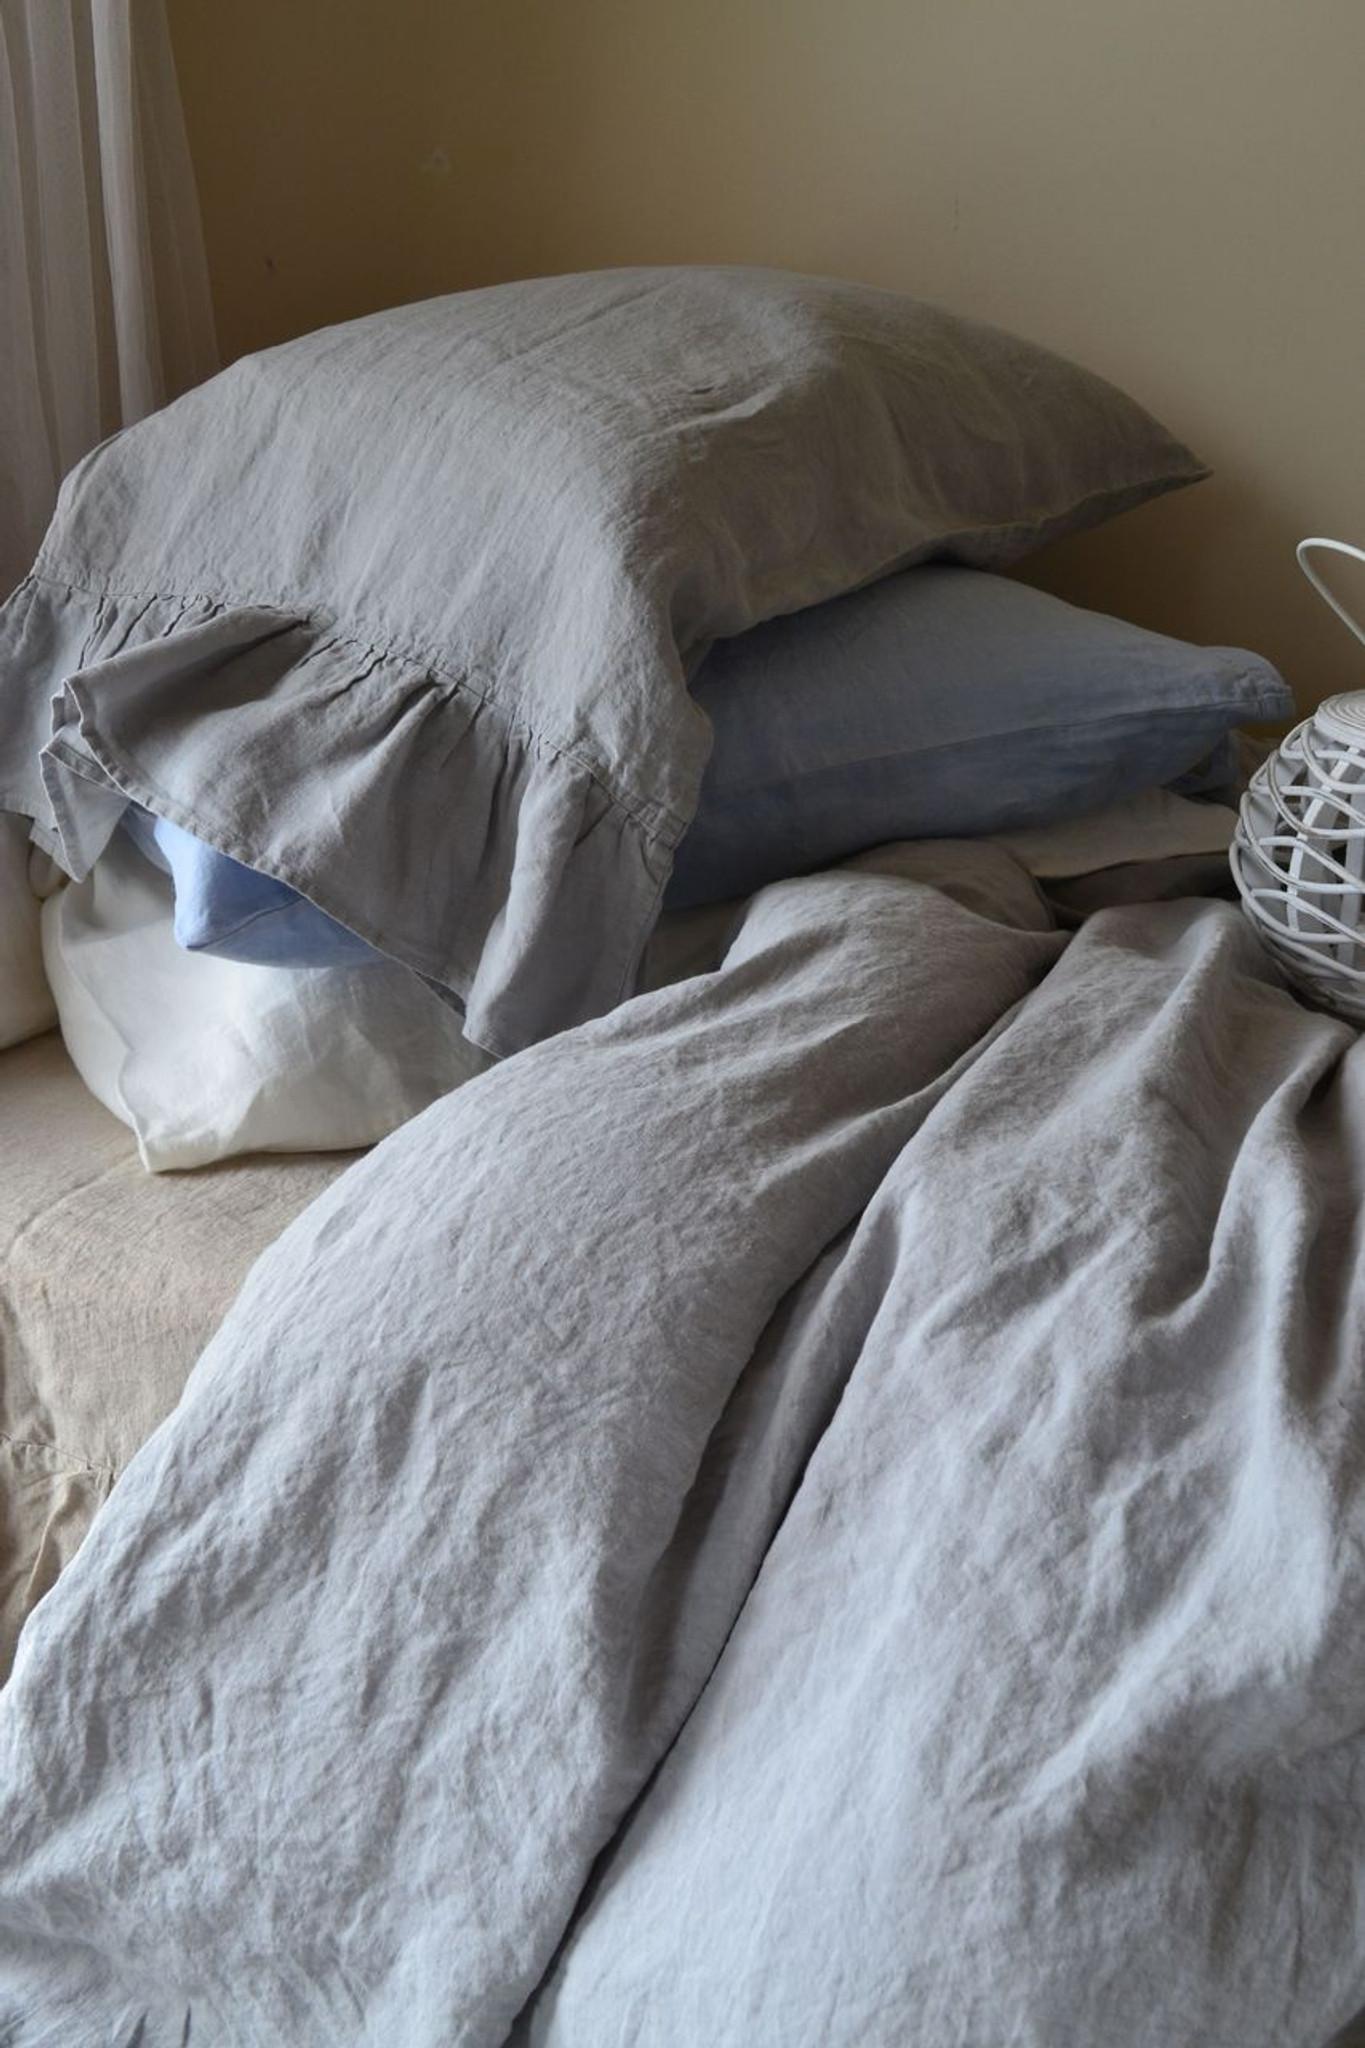 product cover bedding gradation gtgdc duvet pine linen gradationlinenduvetcover p zoom cone gray list hill